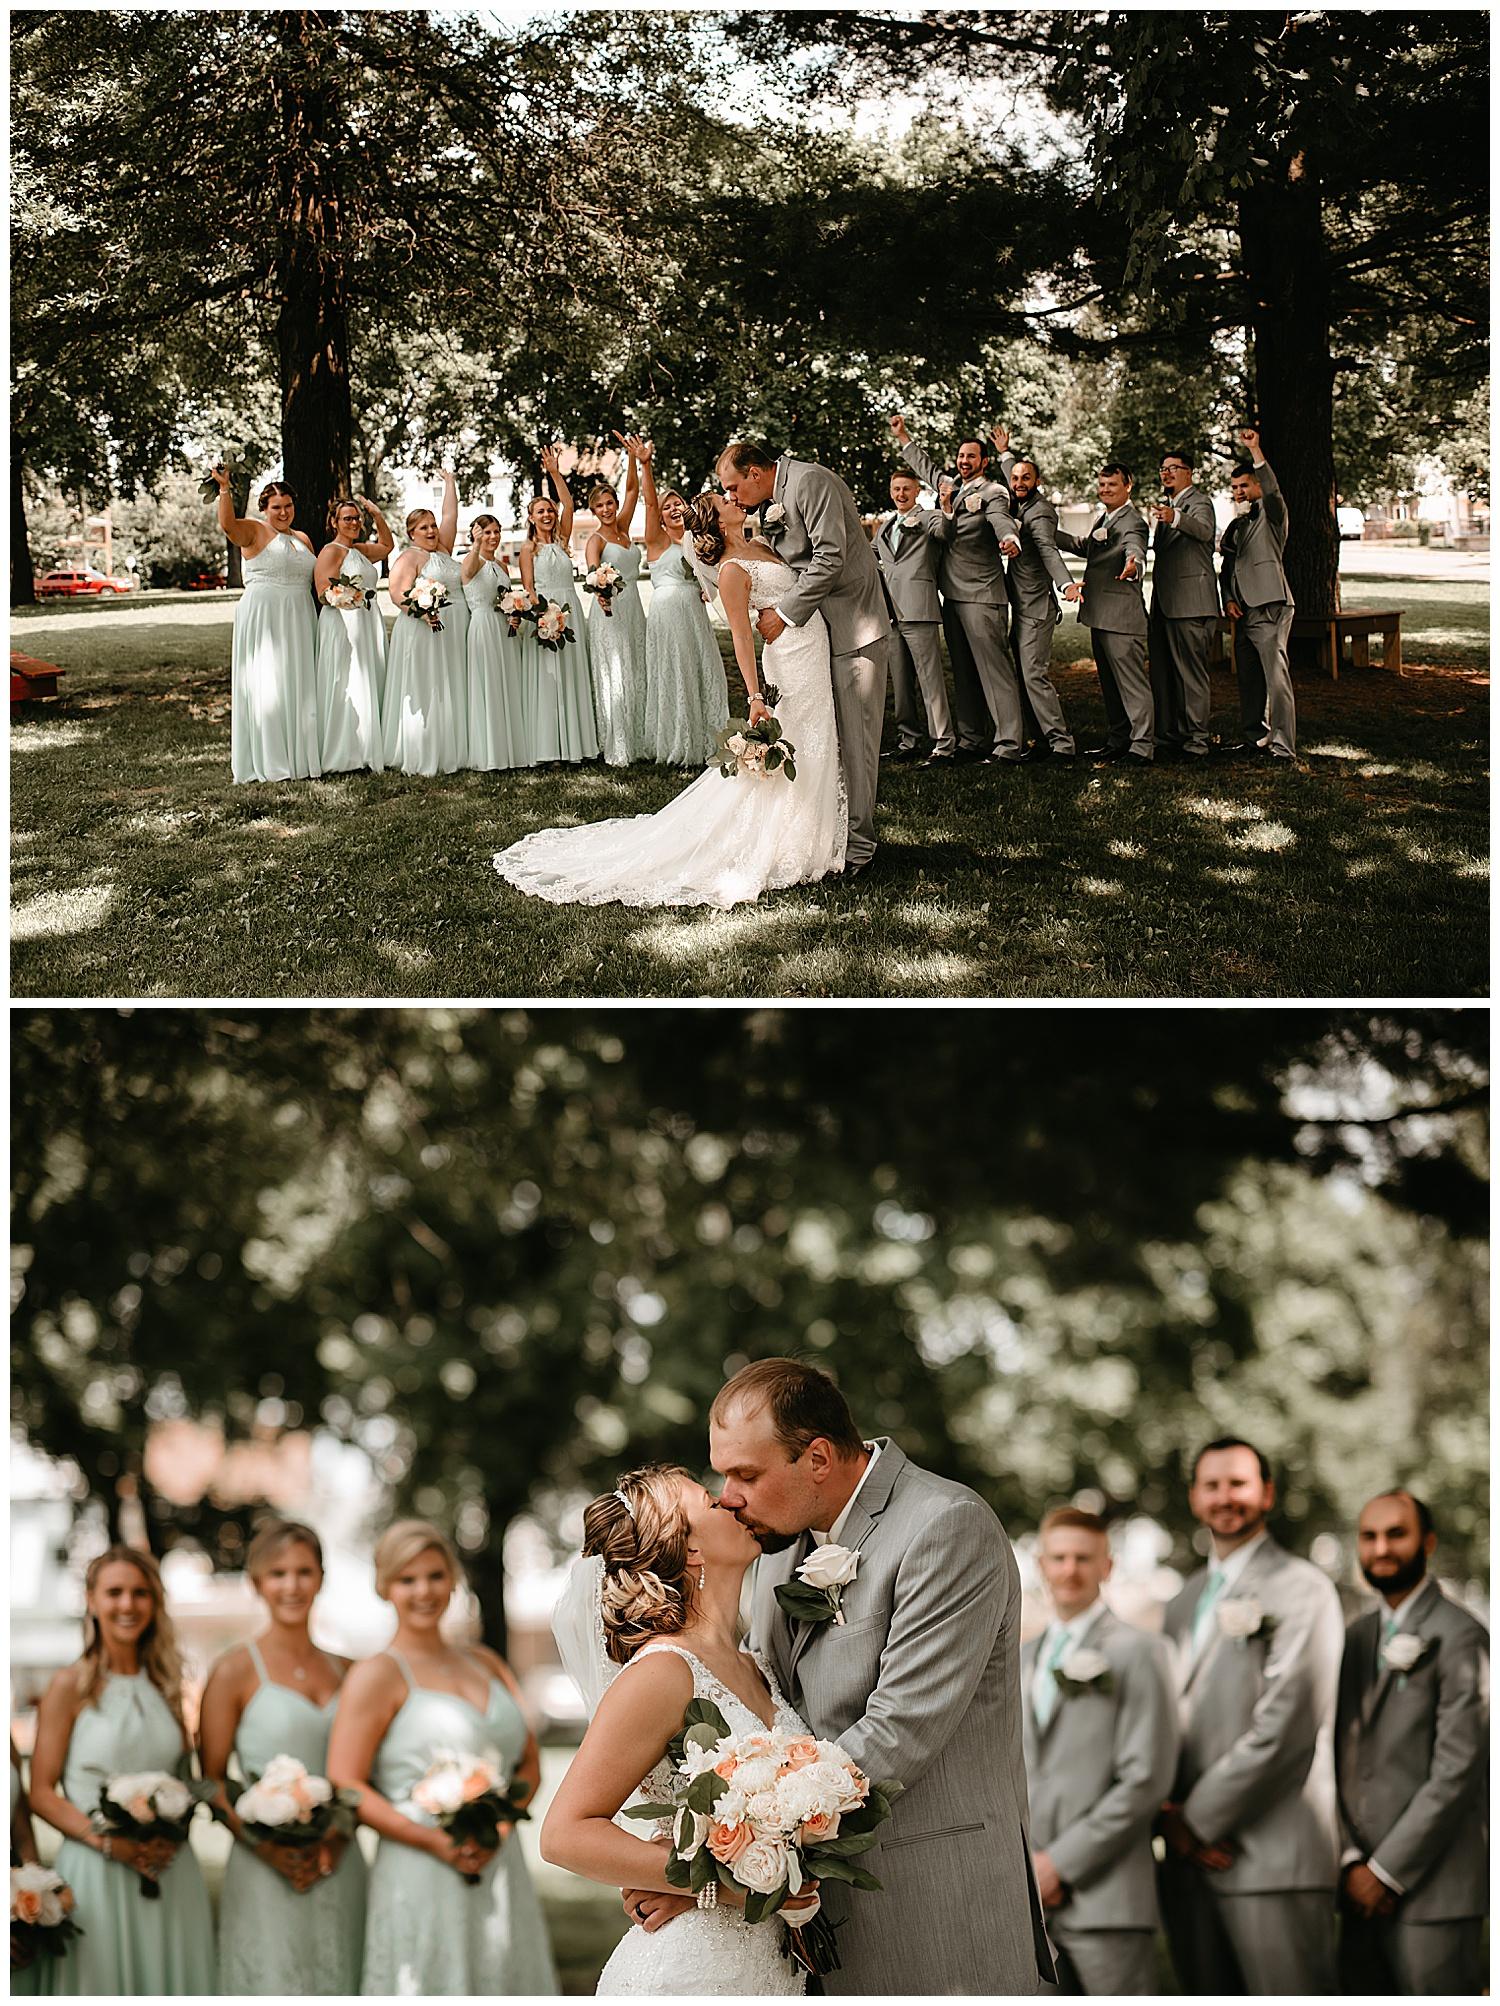 NEPA-Lehigh-Valley-Wedding-Photographer-at-Fountain-Springs-Country-Inn-Ashland-PA_0027.jpg